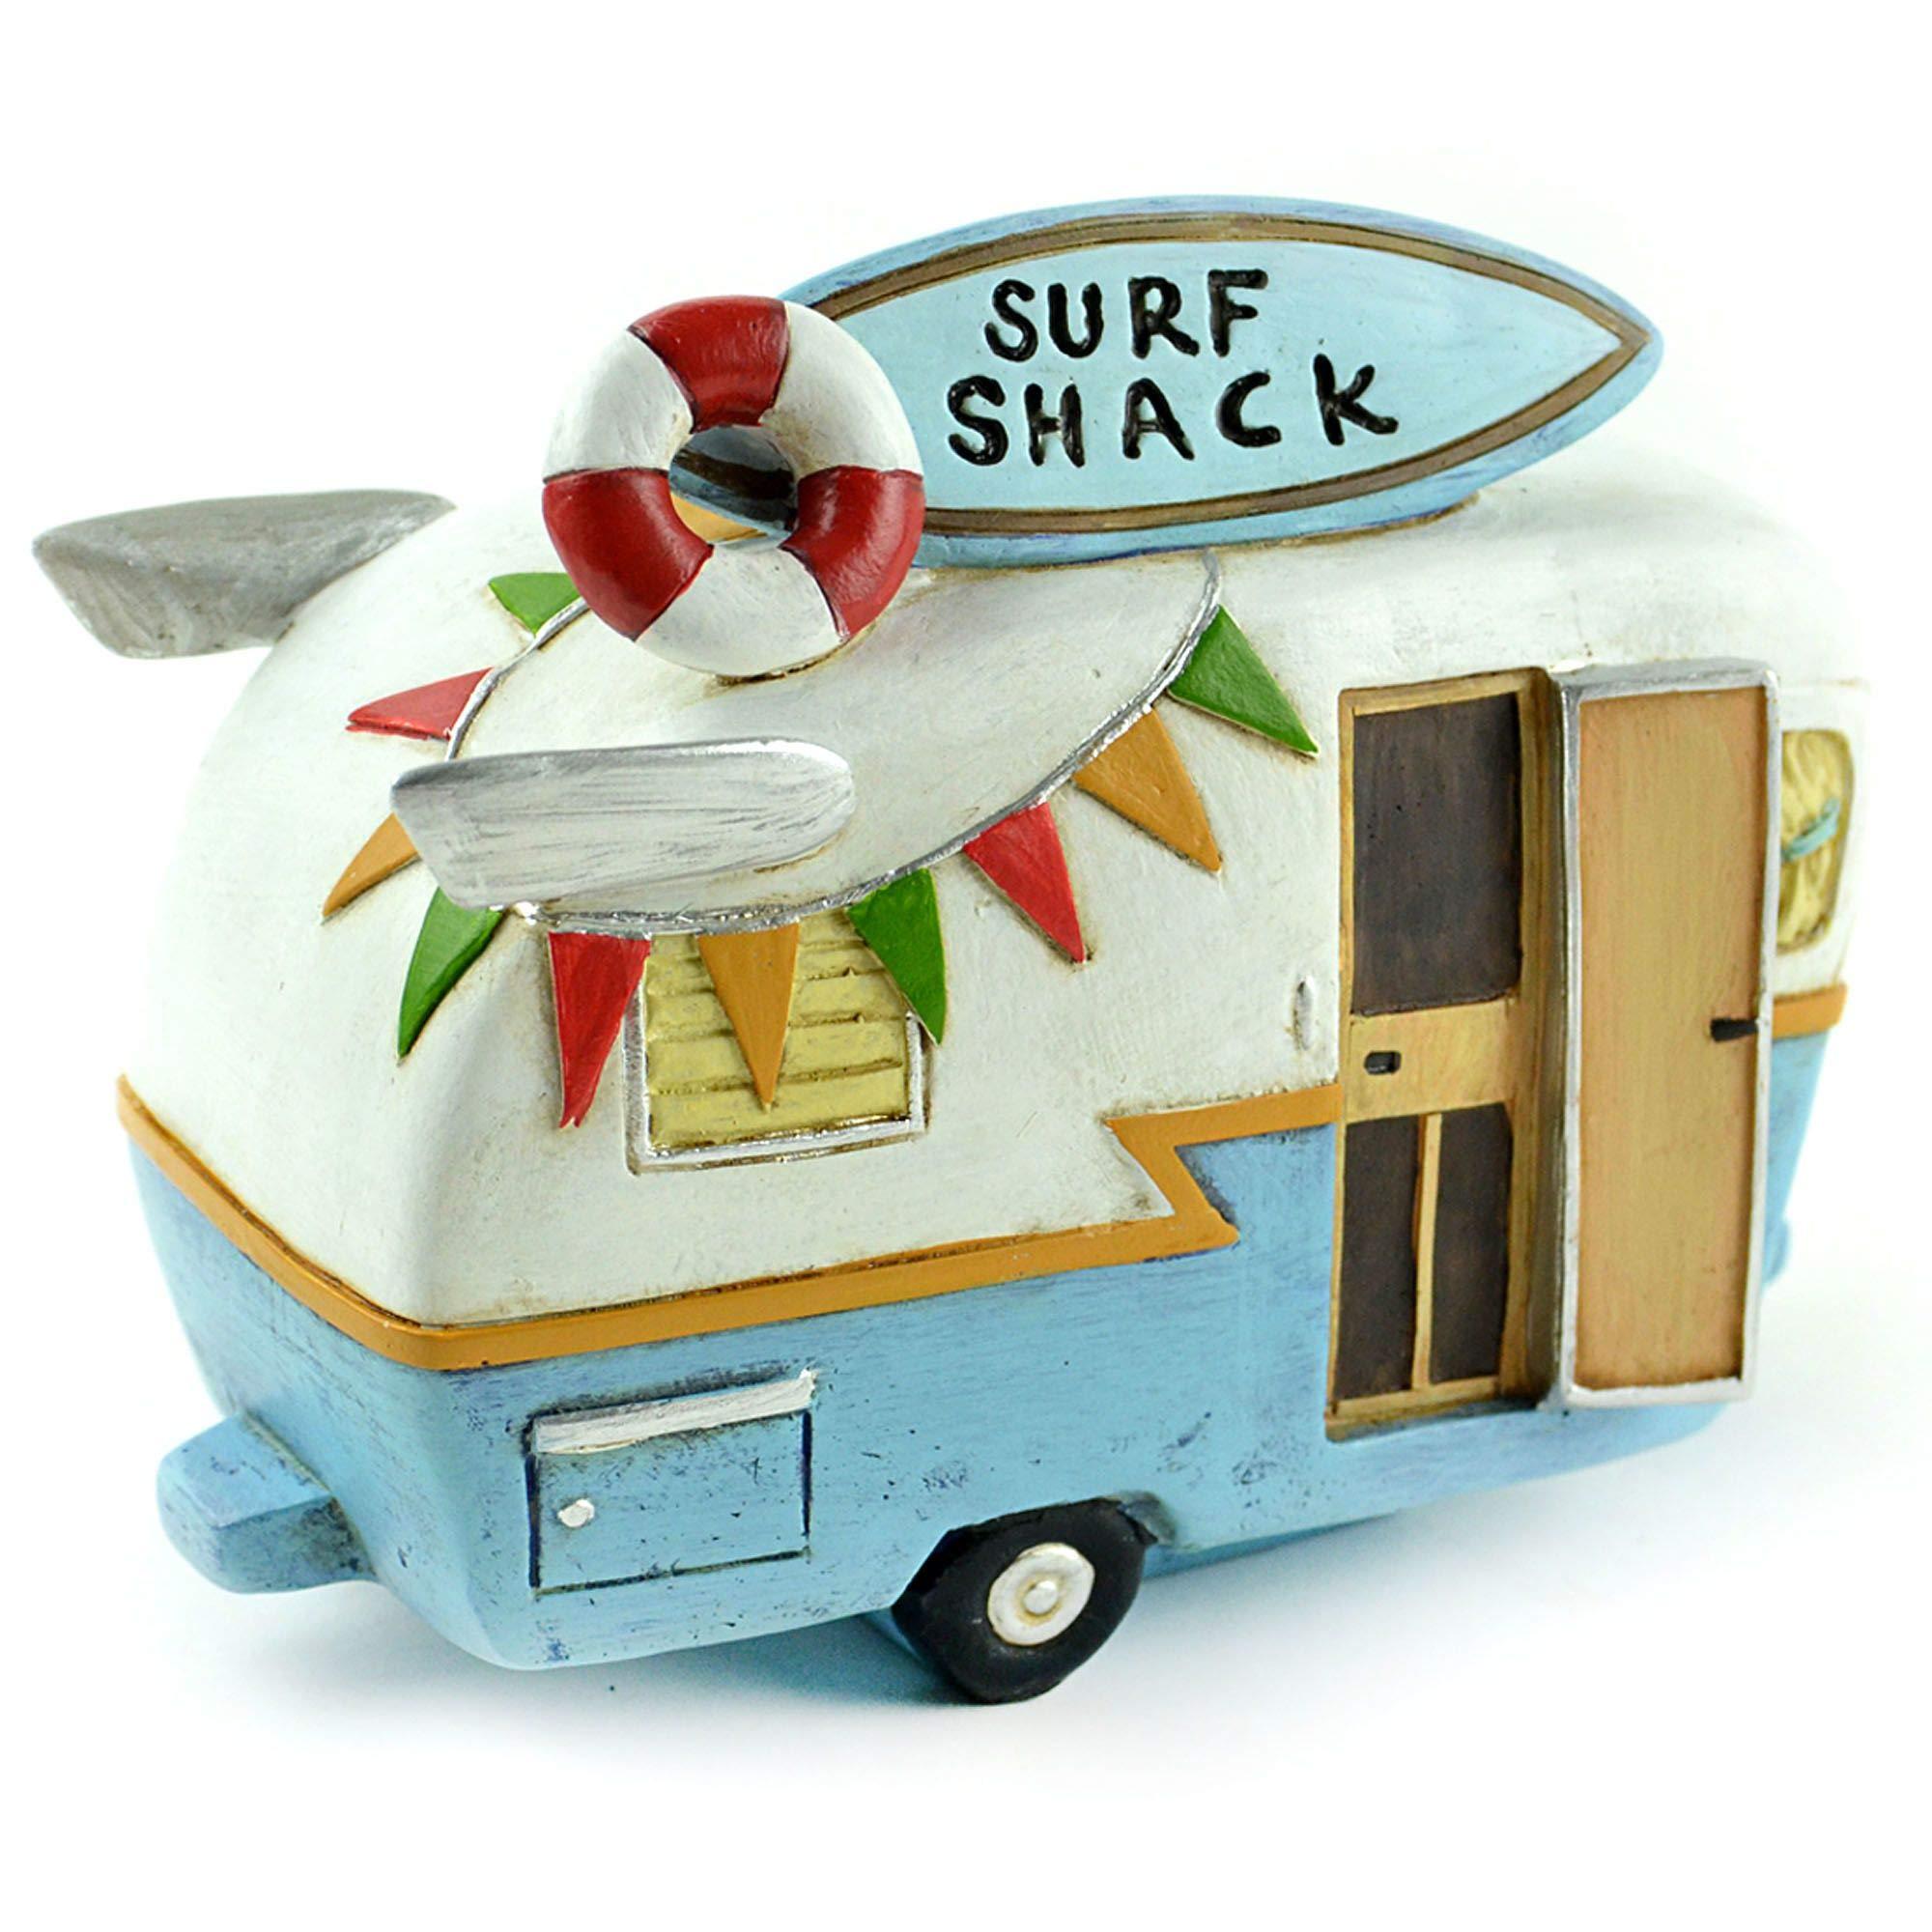 MWD Miniature Fairy Garden Retro Airstream RV Beach Camper Trailer Surf Shack Decor, Mini and Dollhouse Accessories, Surfer Camping Lover Coastal Beach Themed Home Decorations, Resin, 6''